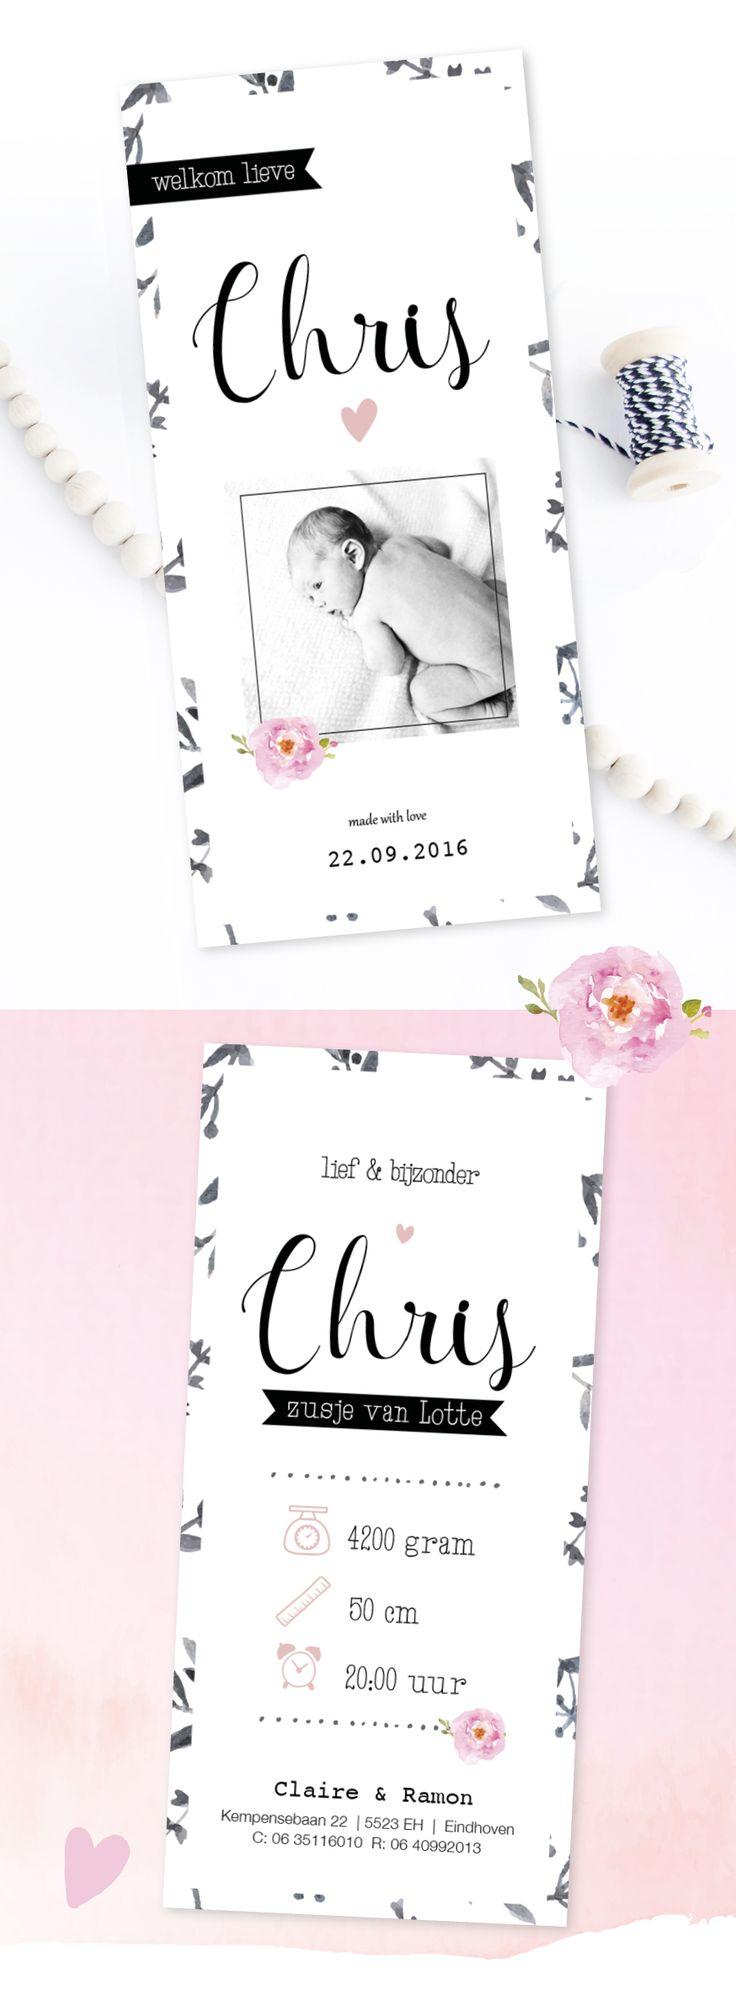 Lief geboortekaartje meisje met foto | ontwerp | bloem | waterverf | watercolor background | roos | roze | zwart wit | icoontjes | www.charlyfine.nl